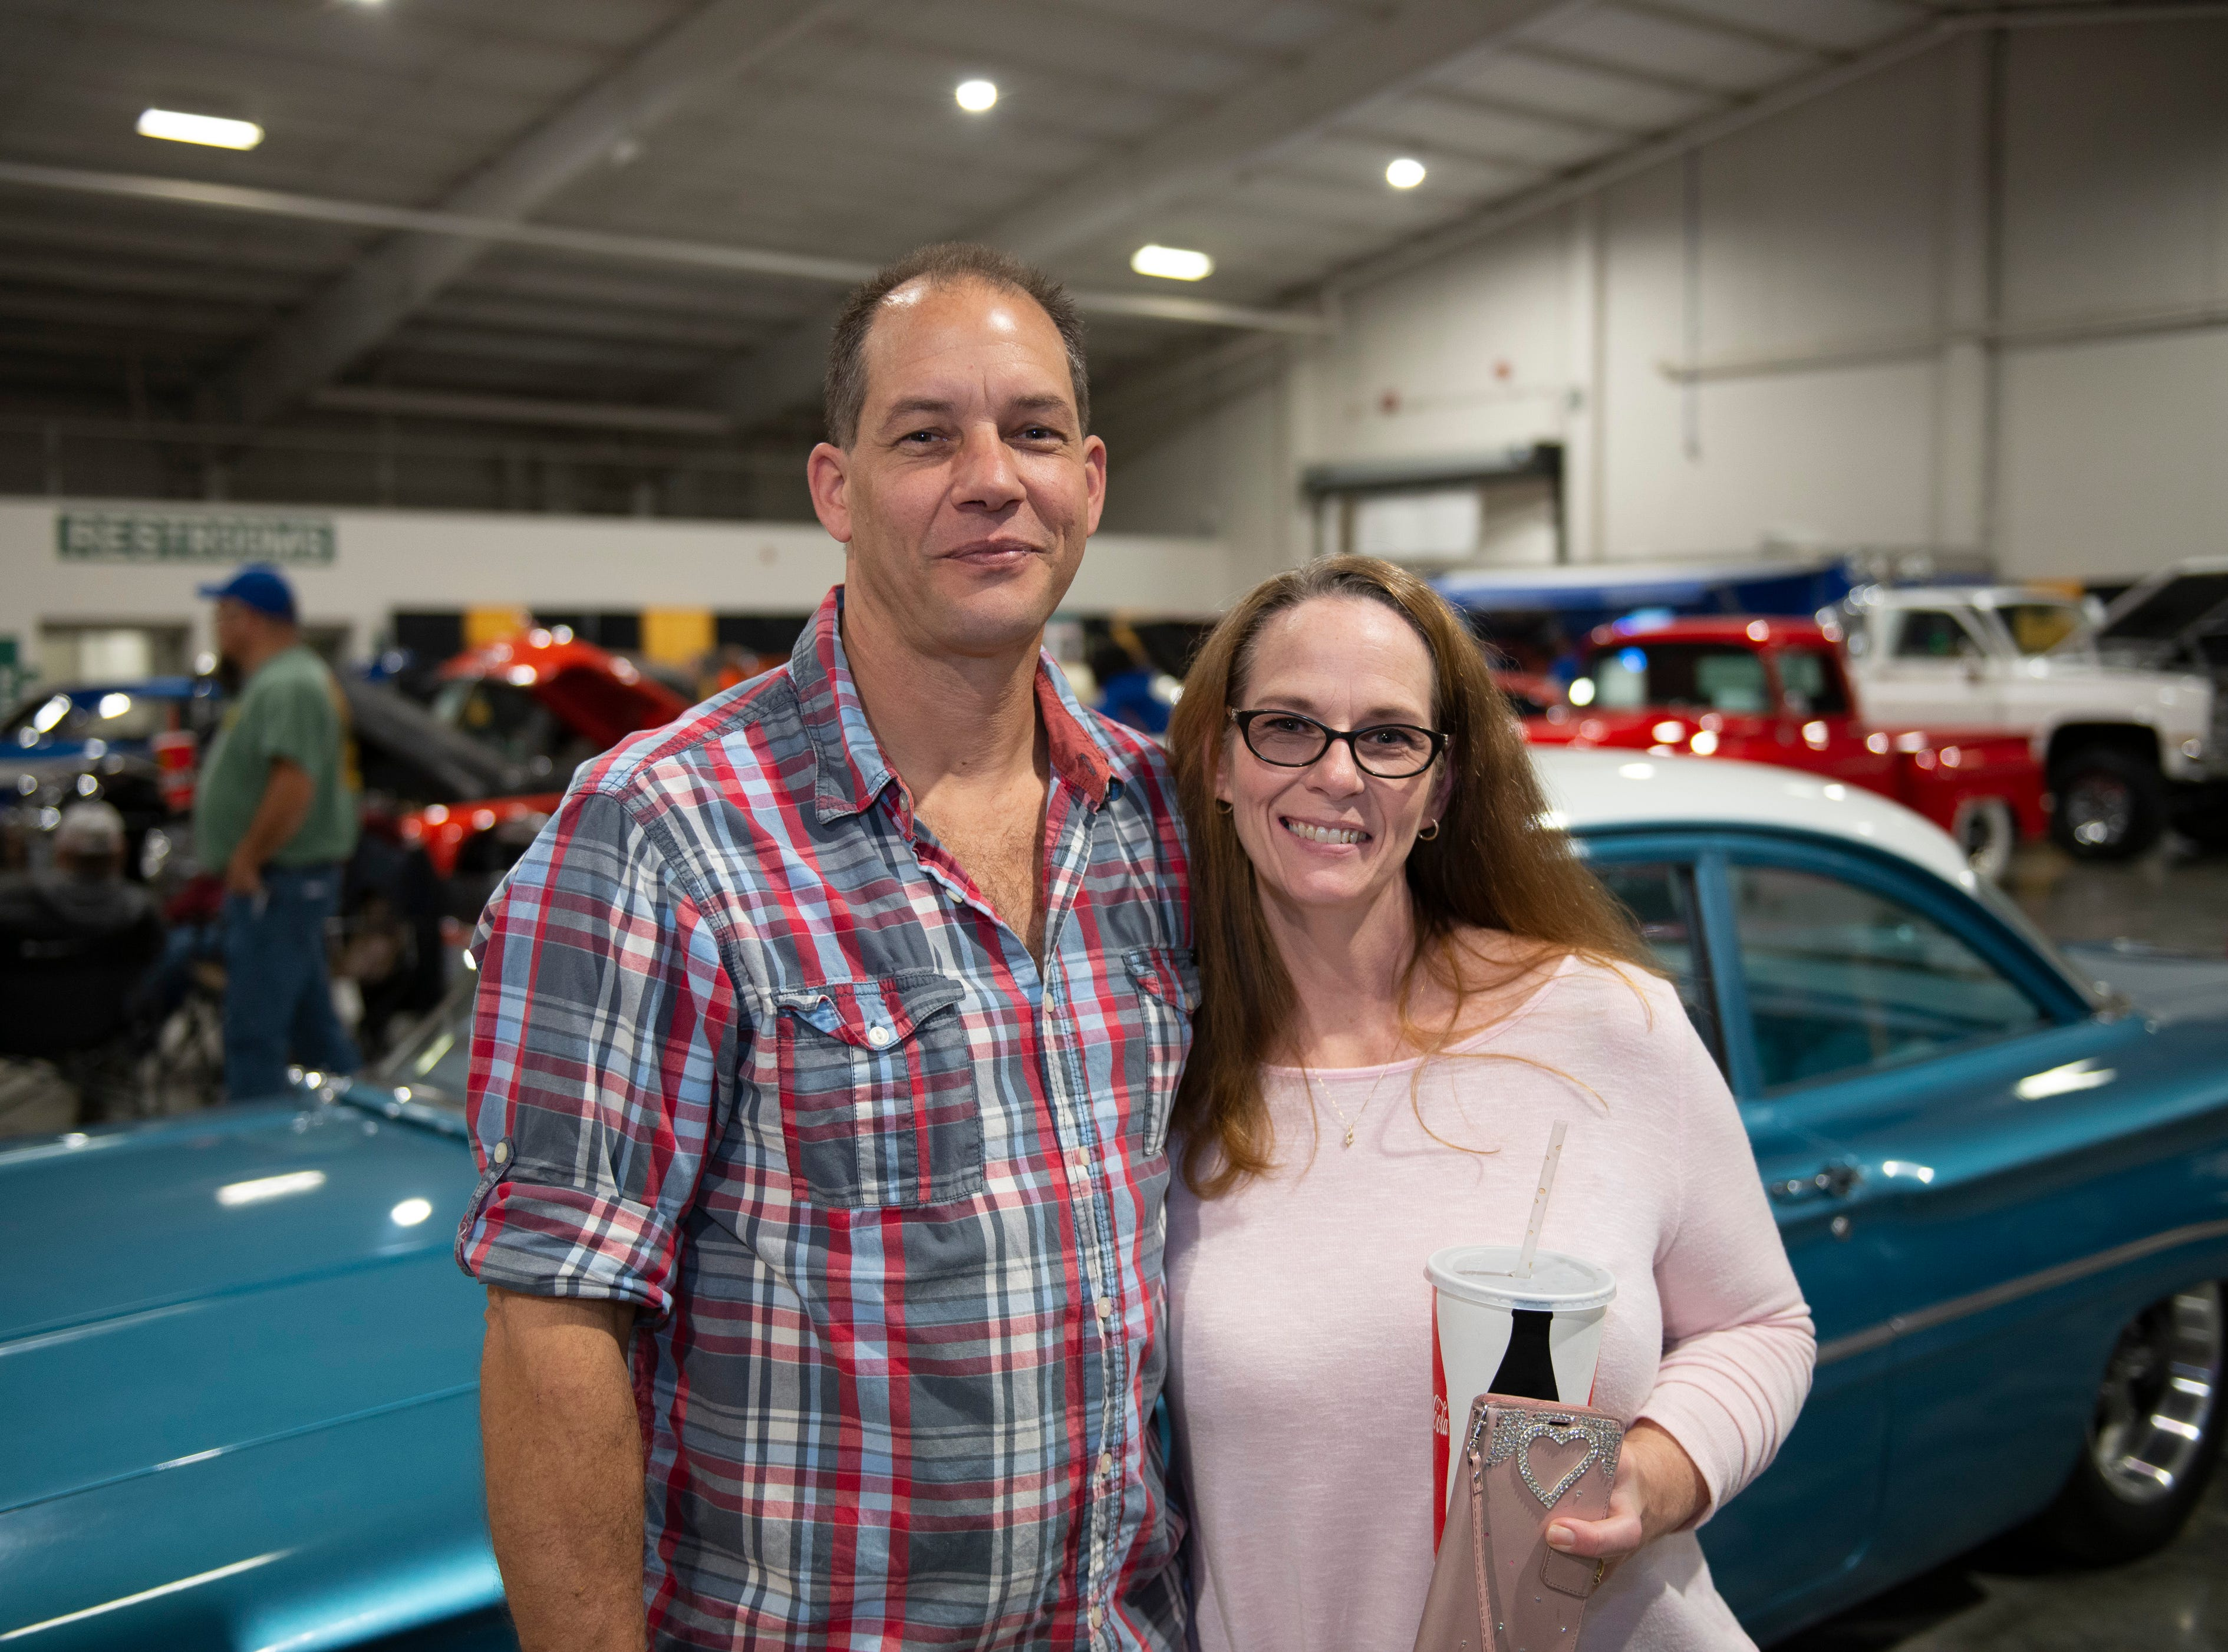 Kirk and Mandy Bradford